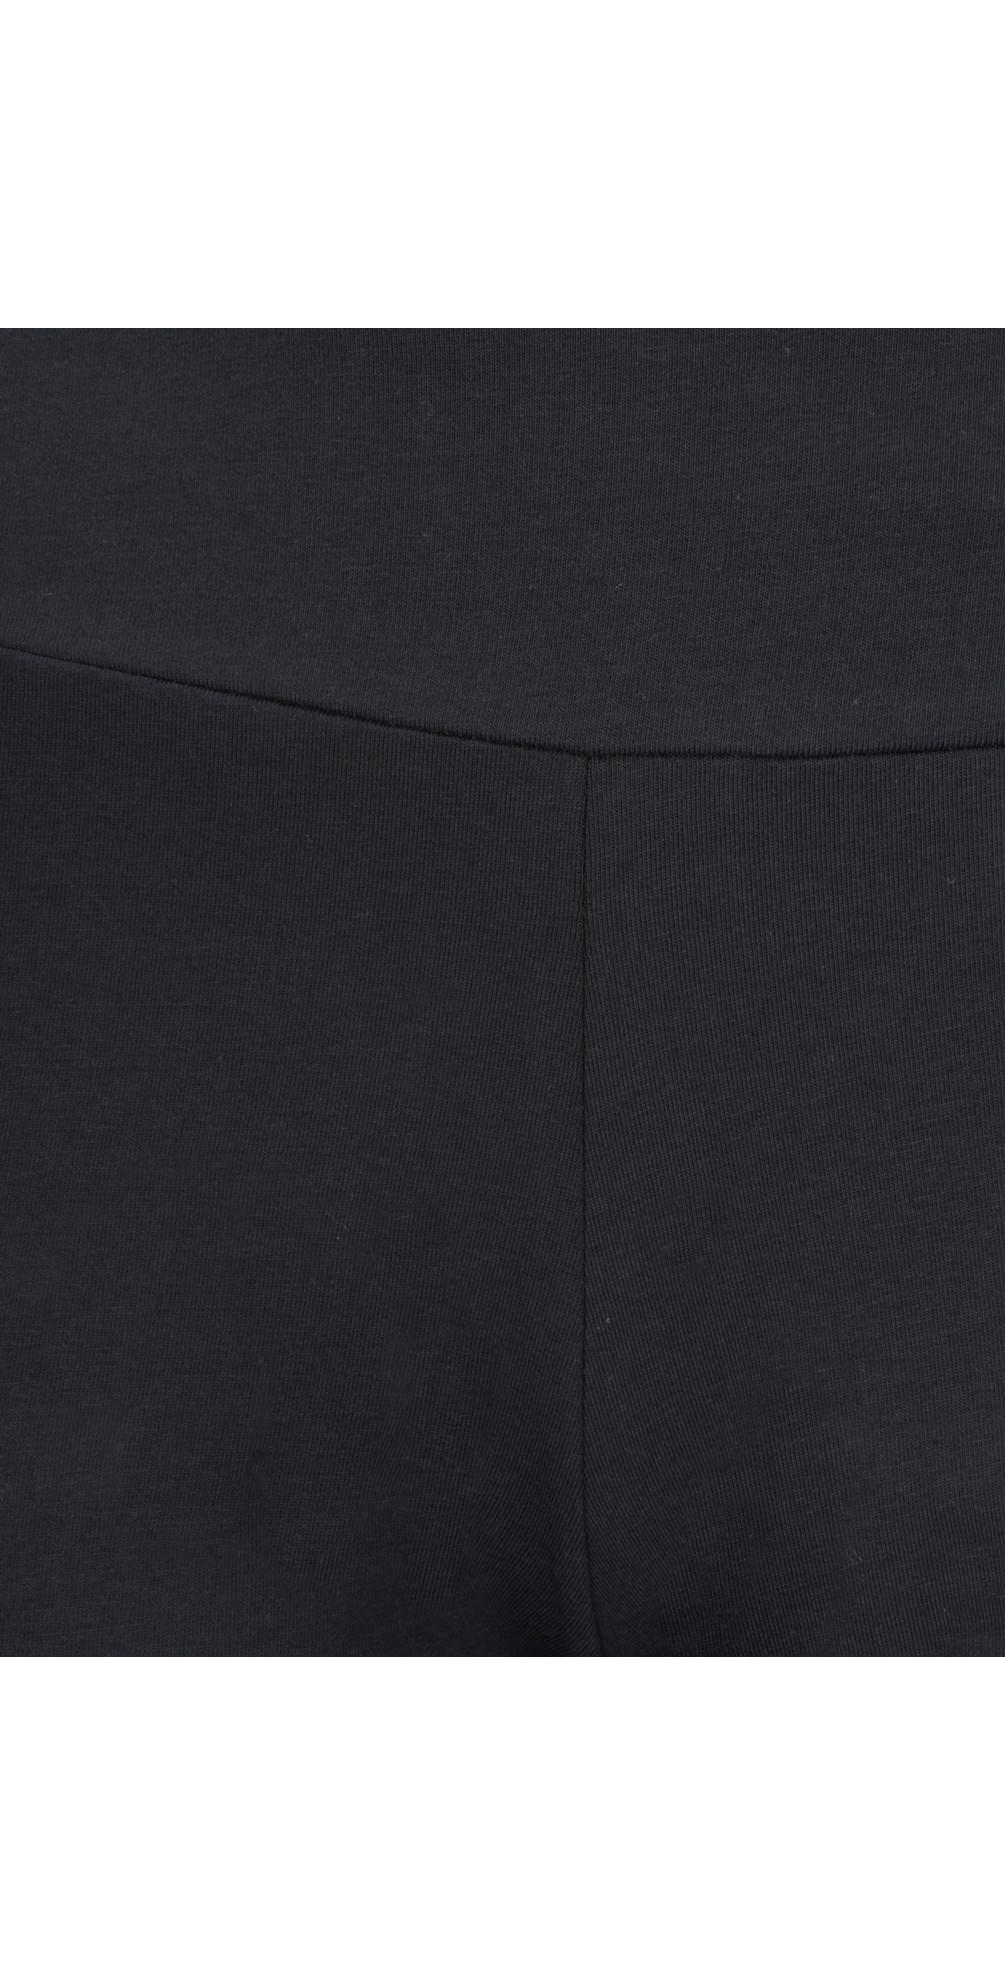 Emmy Corto Trousers main image